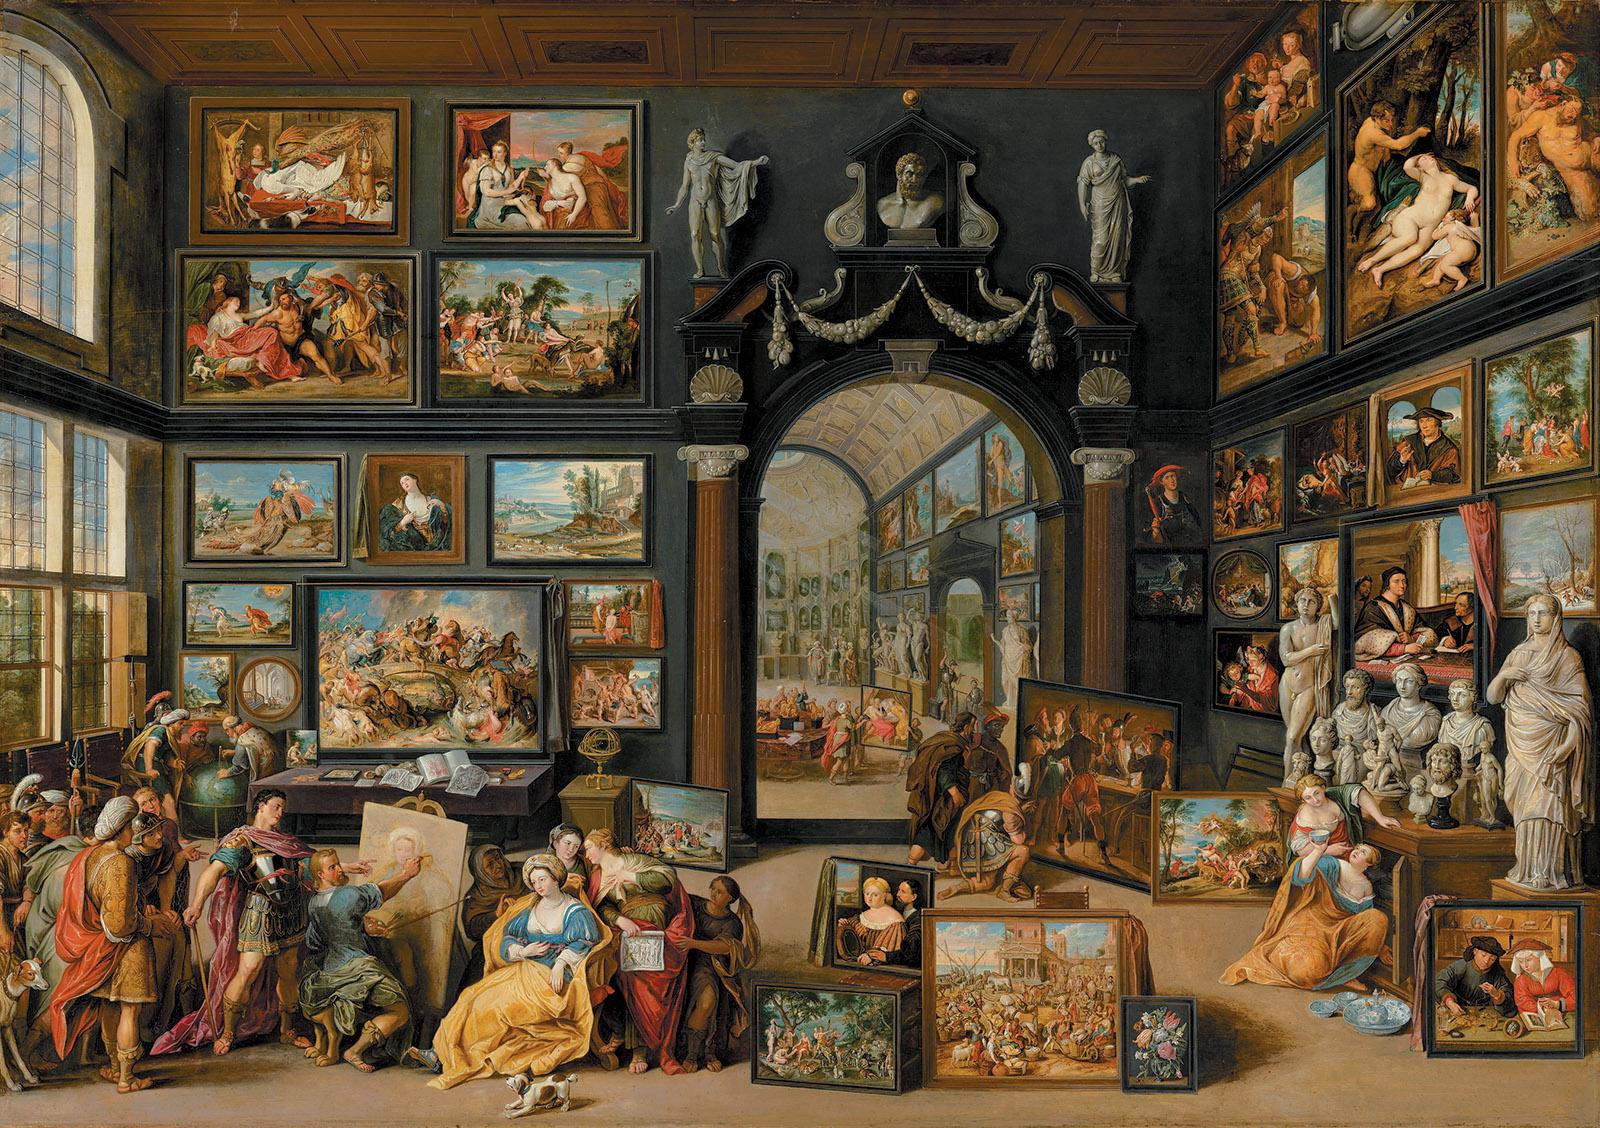 Painting of an art room by Willem van Haecht, circa 1630